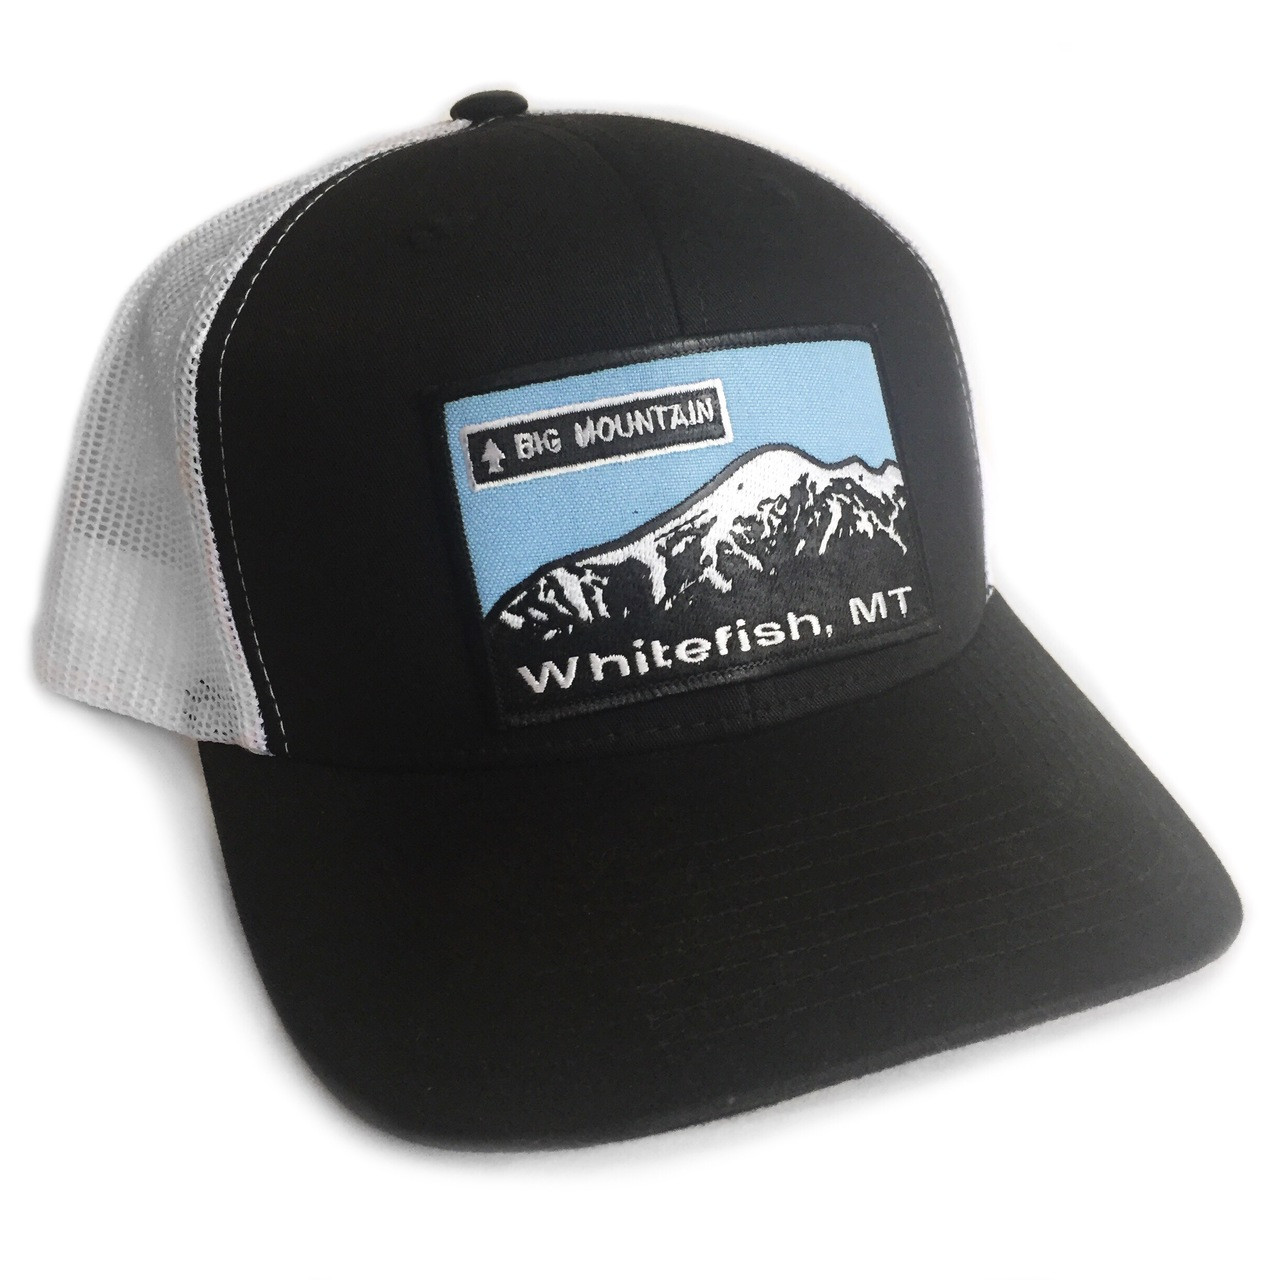 Big Mountain, Whitefish Mt Trucker Hat